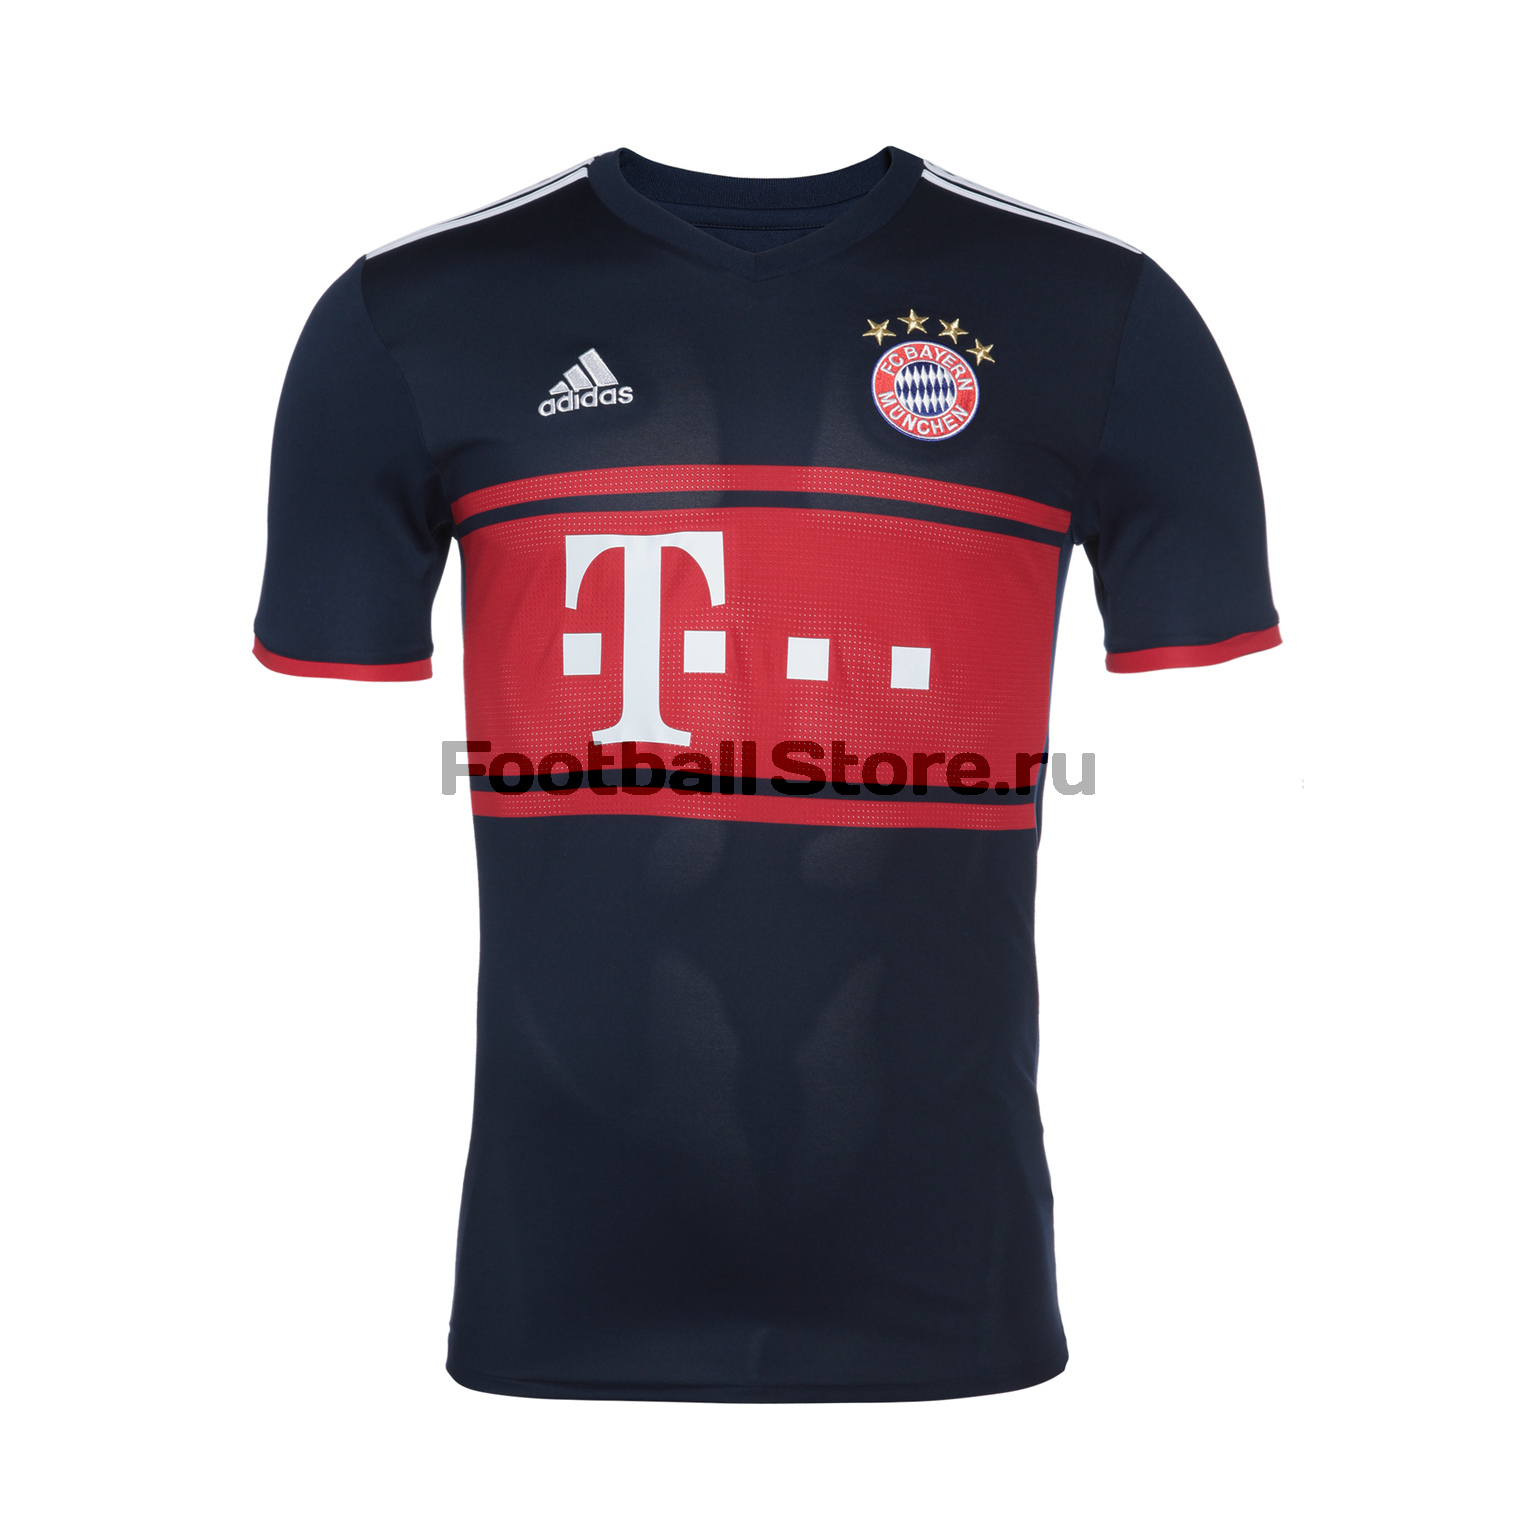 Bayern Adidas Футболка игровая Adidas Bayern Away AZ7937 adidas футболка russia away